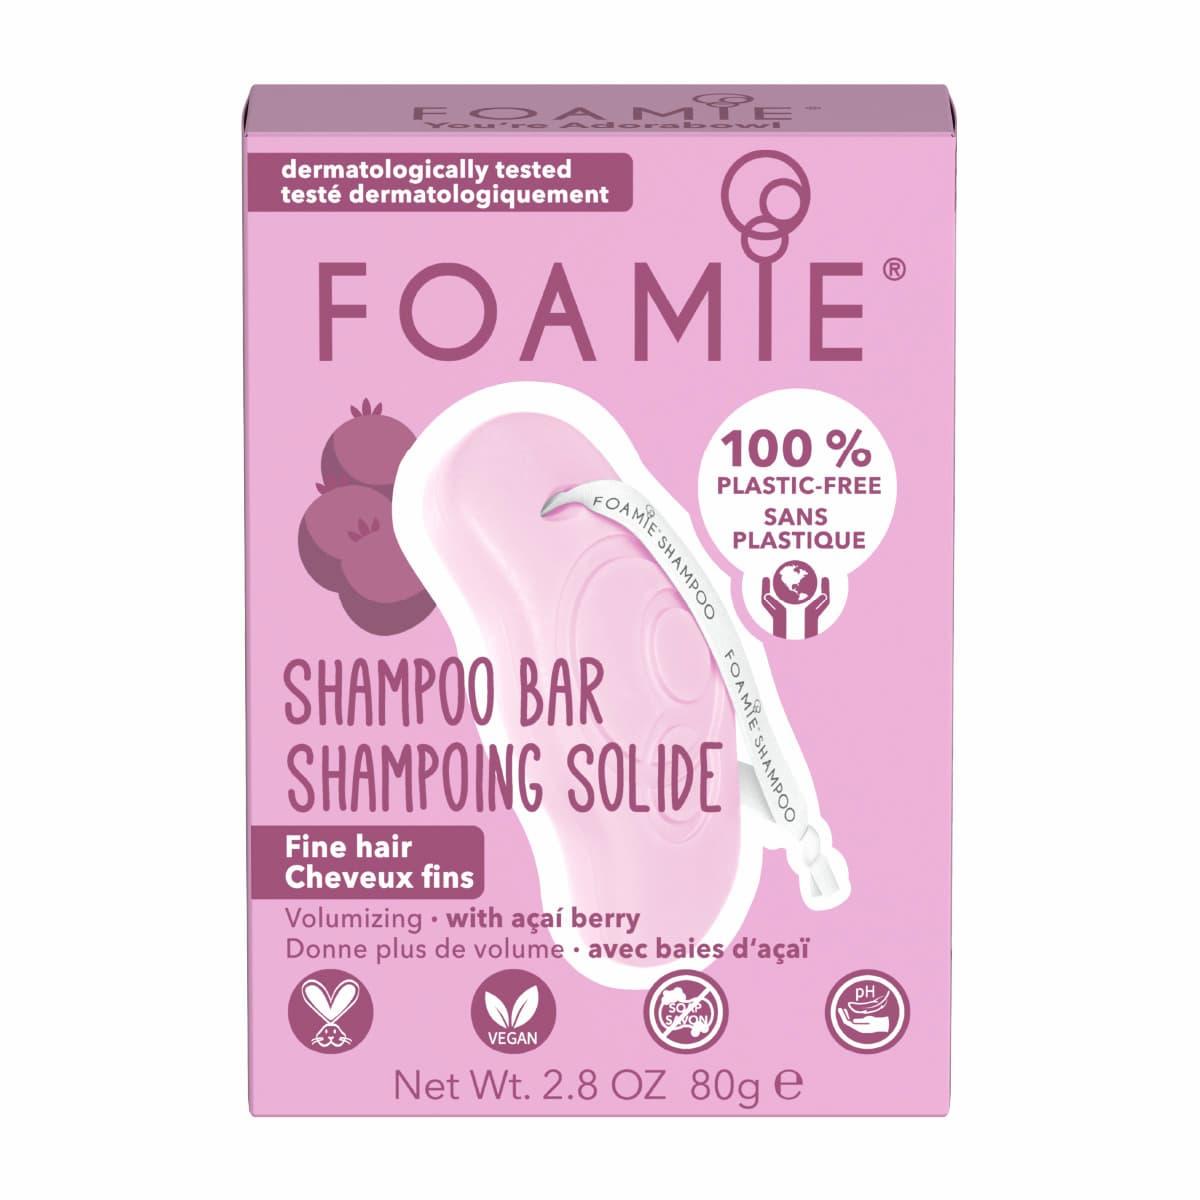 Foamie - Shampoing solide - You're Adorabowl